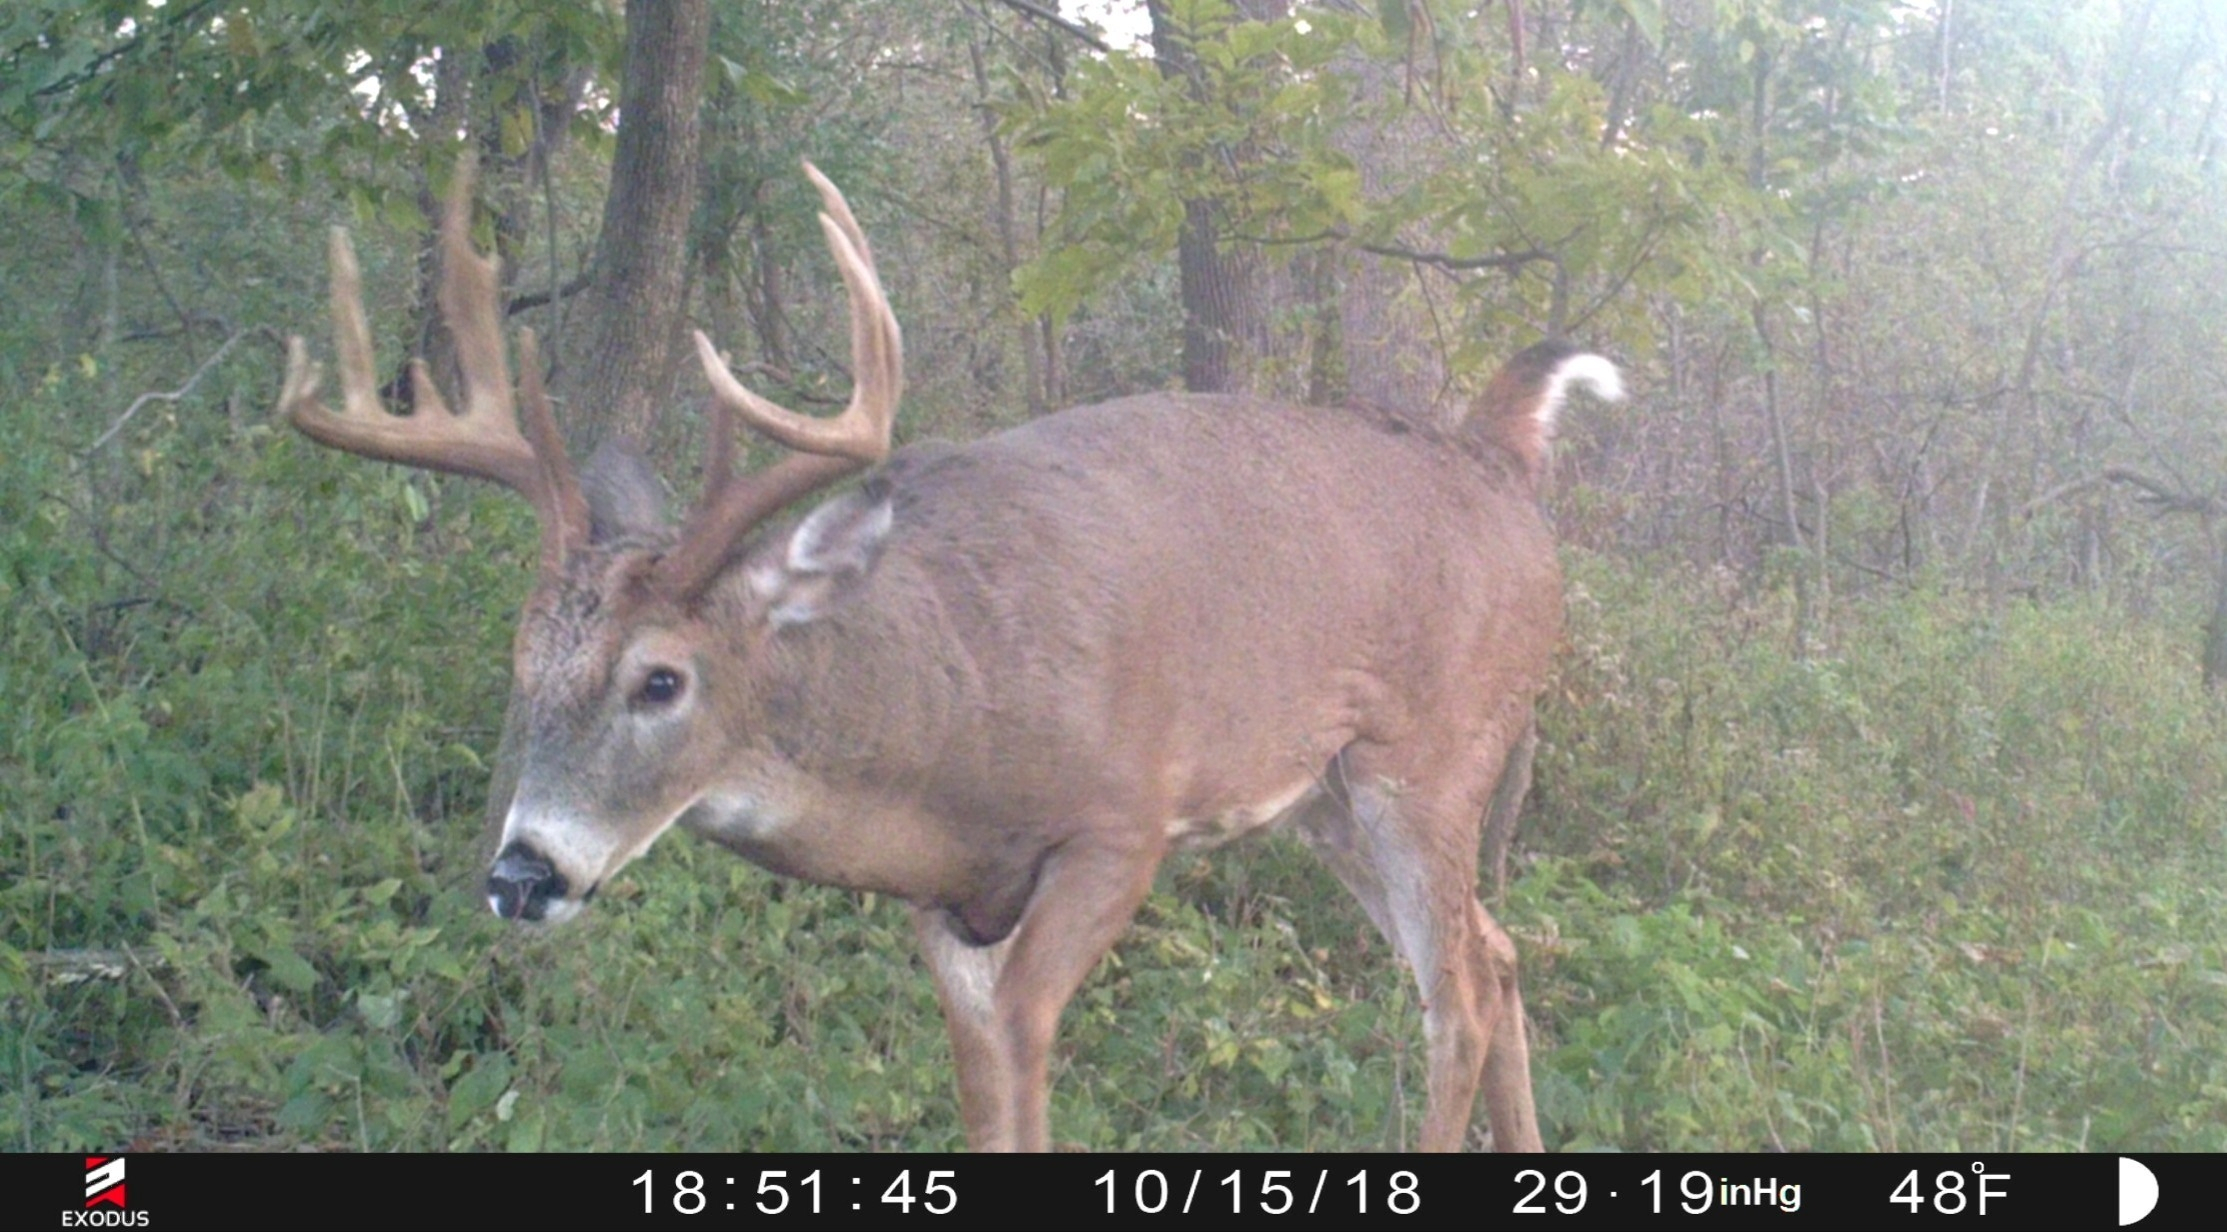 Nj Deer Rut Forcast 2021 - Template Calendar Design intended for Deer Rut Forcast Indiana 2021